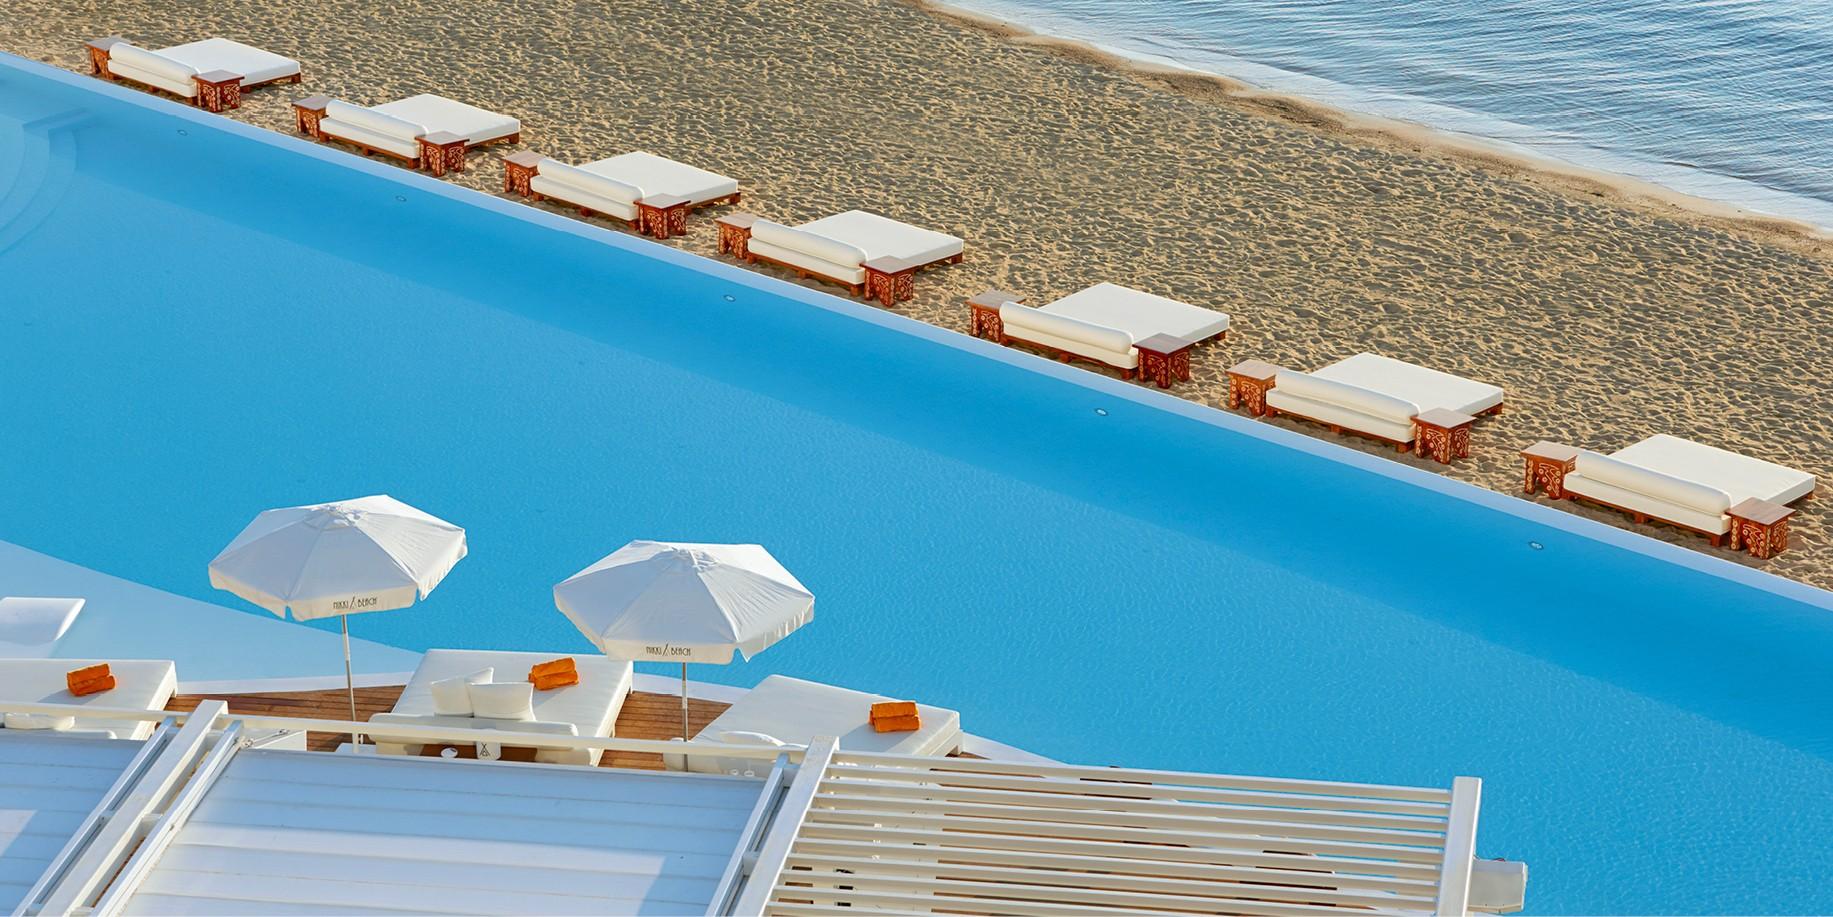 Nikki Beach Resort & Spa Porto Heli: Απόδραση σε έναν επίγειο παράδεισο Ψάχνοντας τον No1 προορισμό για τις καλοκαιρινές διακοπές στο μυαλό μας έρχεται πάντα το Nikki Beach Porto Heli. Σε κοντινή απόσταση απο την Αθήνα με μαγευτικά τοπία και luxury παροχές, το συγκεκριμένο έχει όλα όσα ψάχνουμε για ένα καλοκαίρι όνειρο.